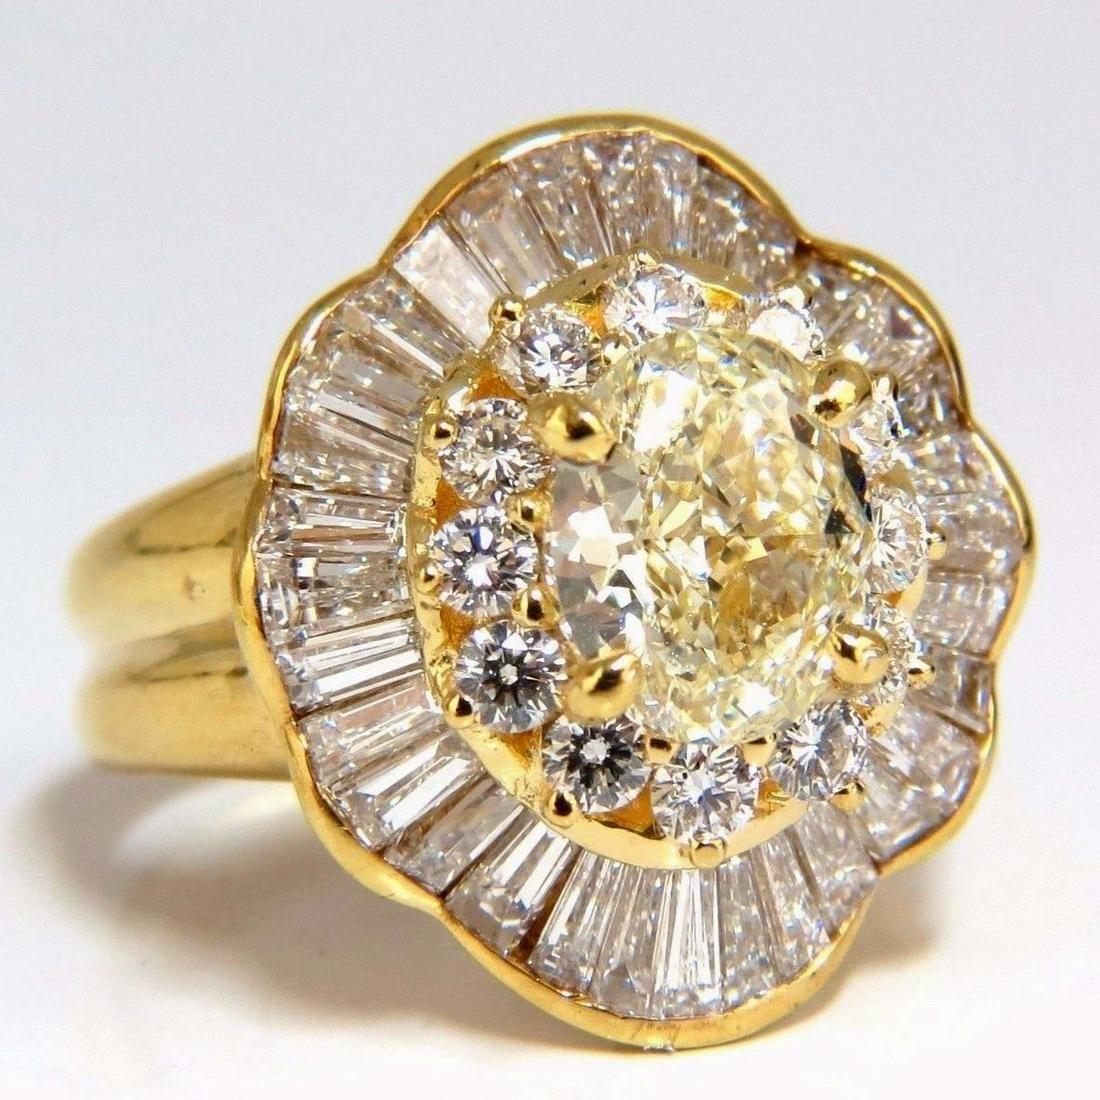 GIA Certified 4.51ct Natural Yellow Diamond Ring 18Kt